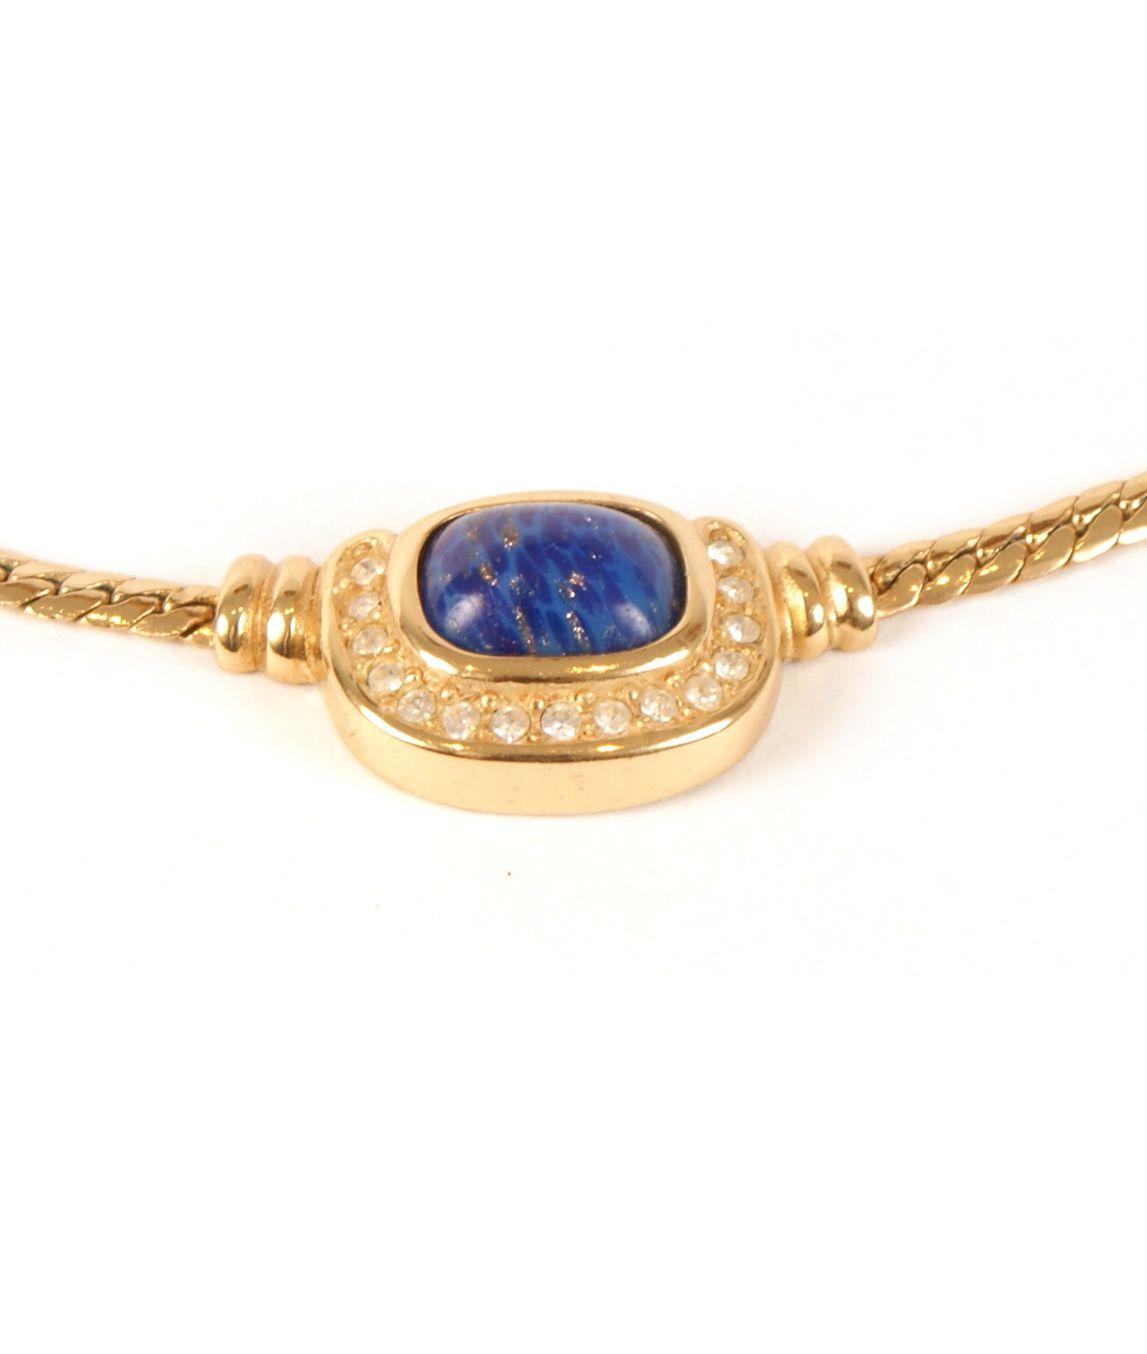 Dior faux lapis lazuli blue stone close up